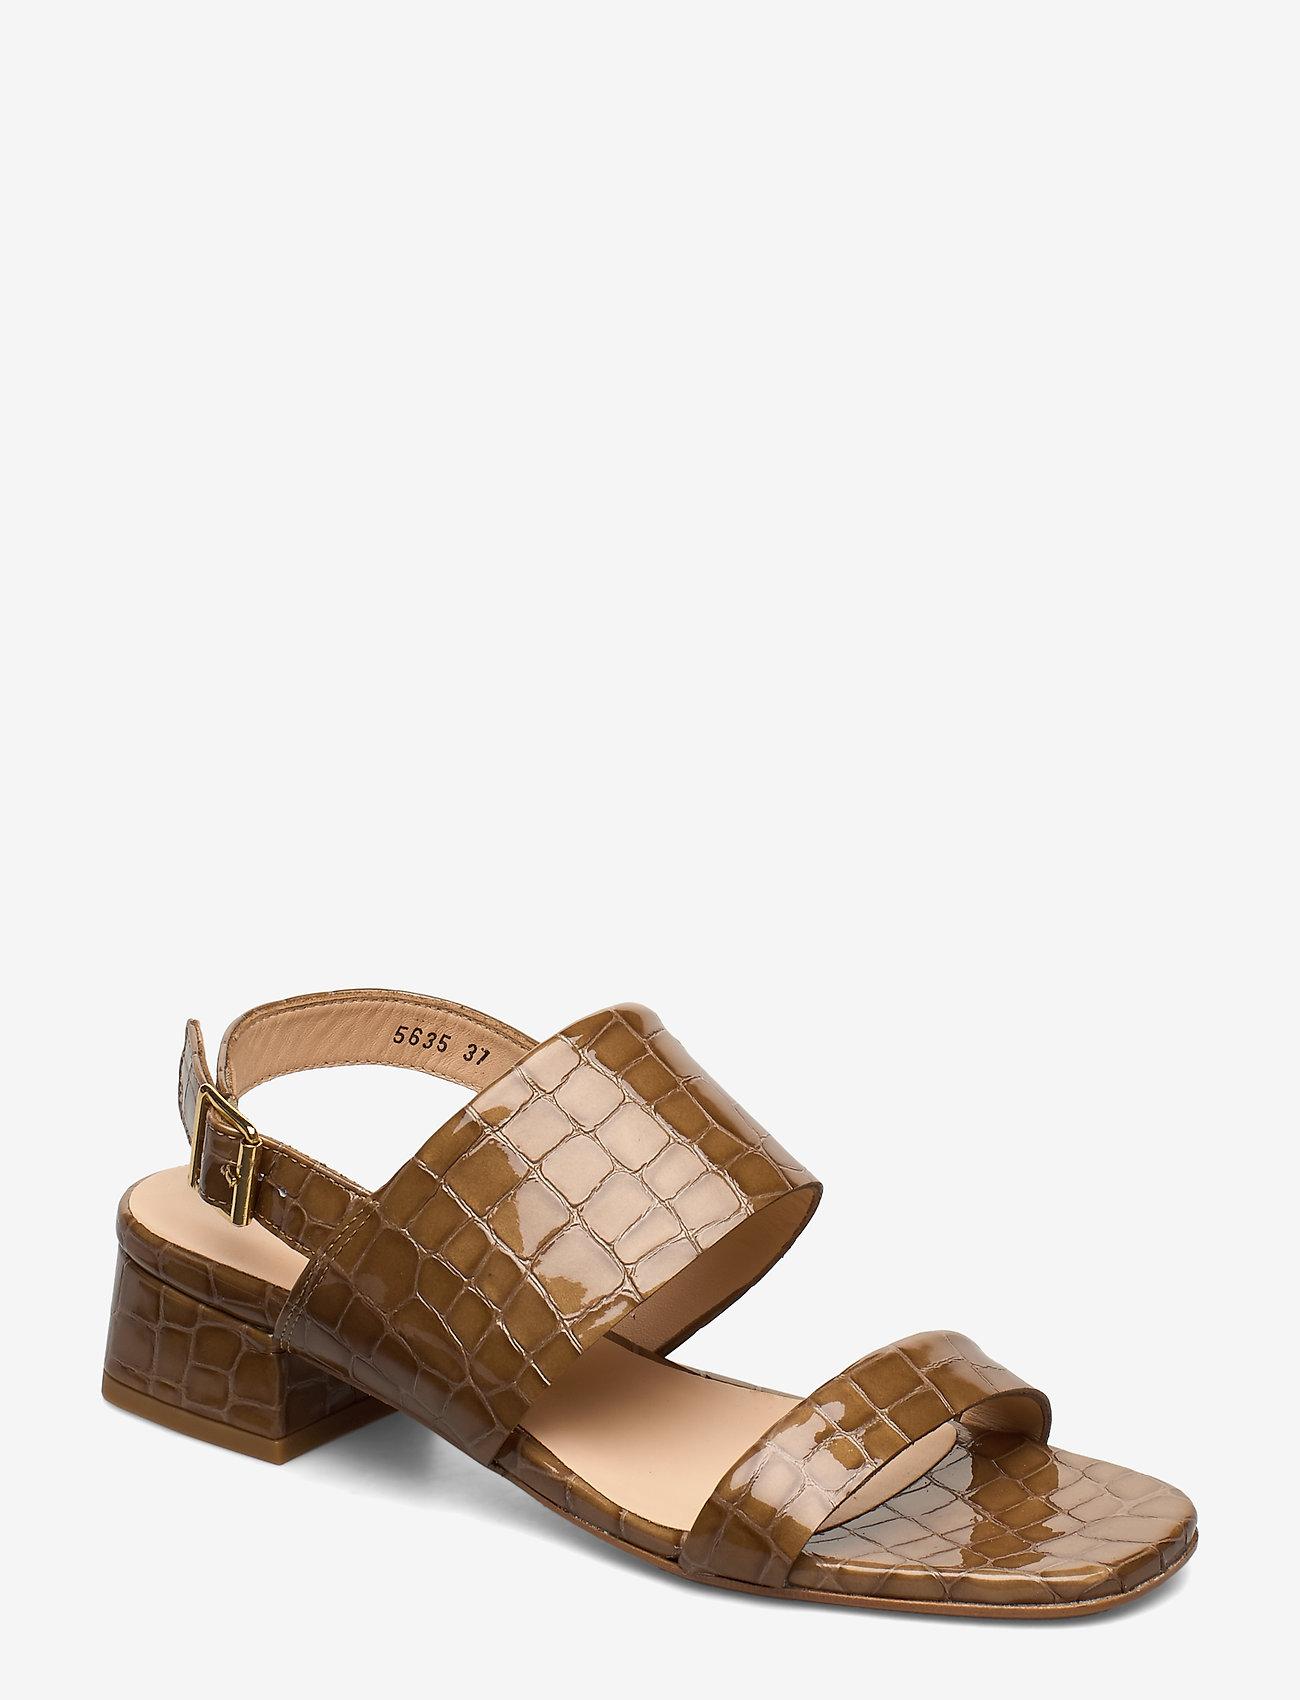 ANGULUS - Sandals - Block heels - høyhælte sandaler - 1671 tan krokodille - 0